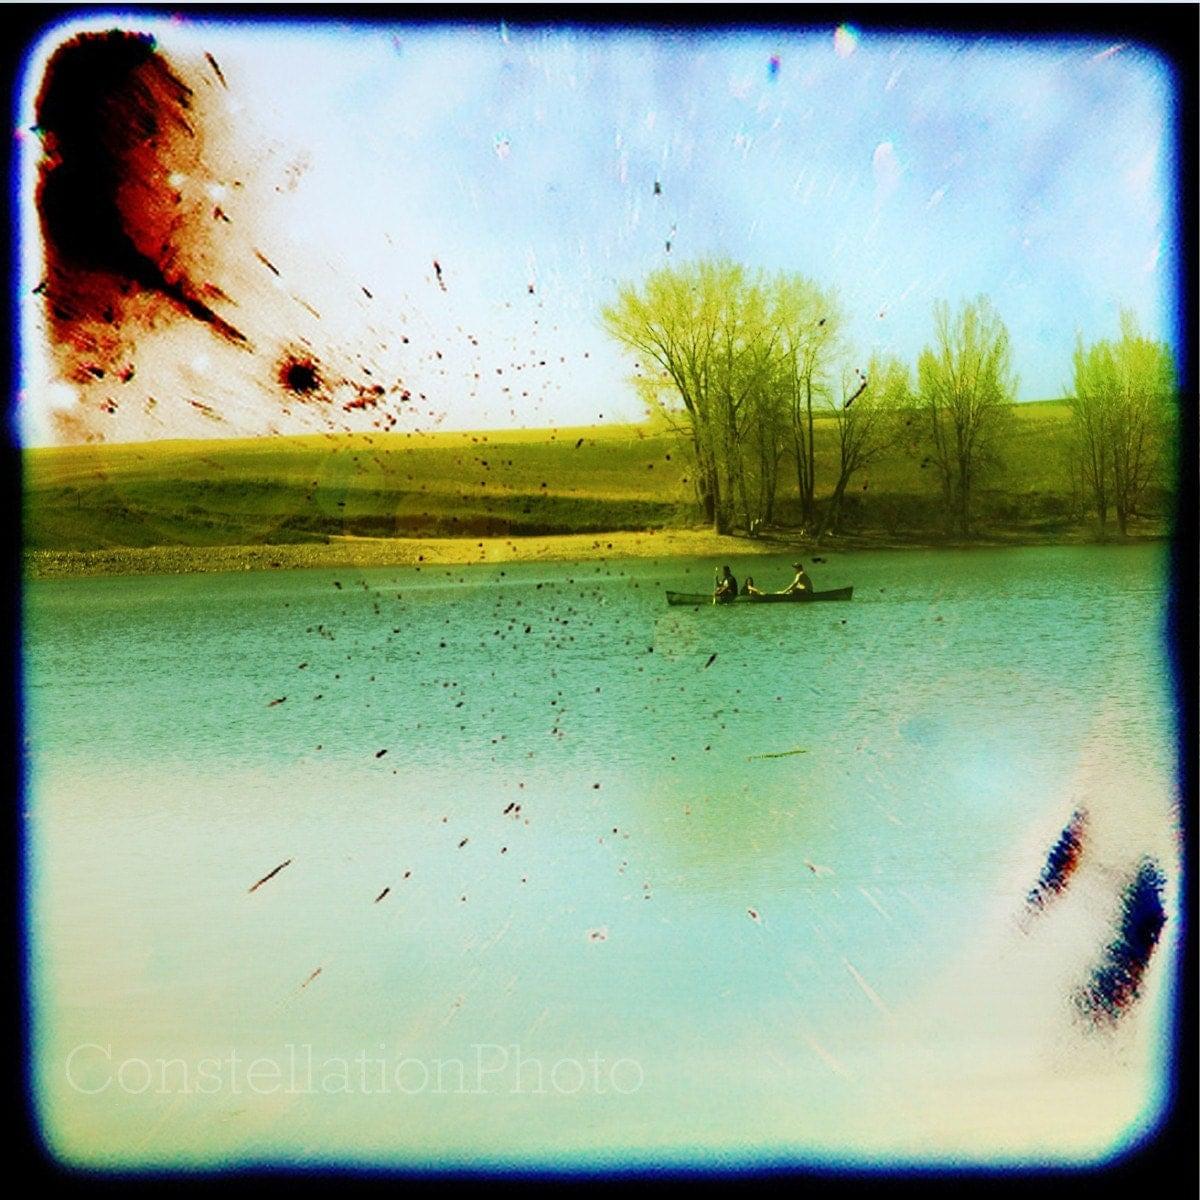 Gone Fishin'.............8x8 Fine Art Photo.......... by Amanda Graham